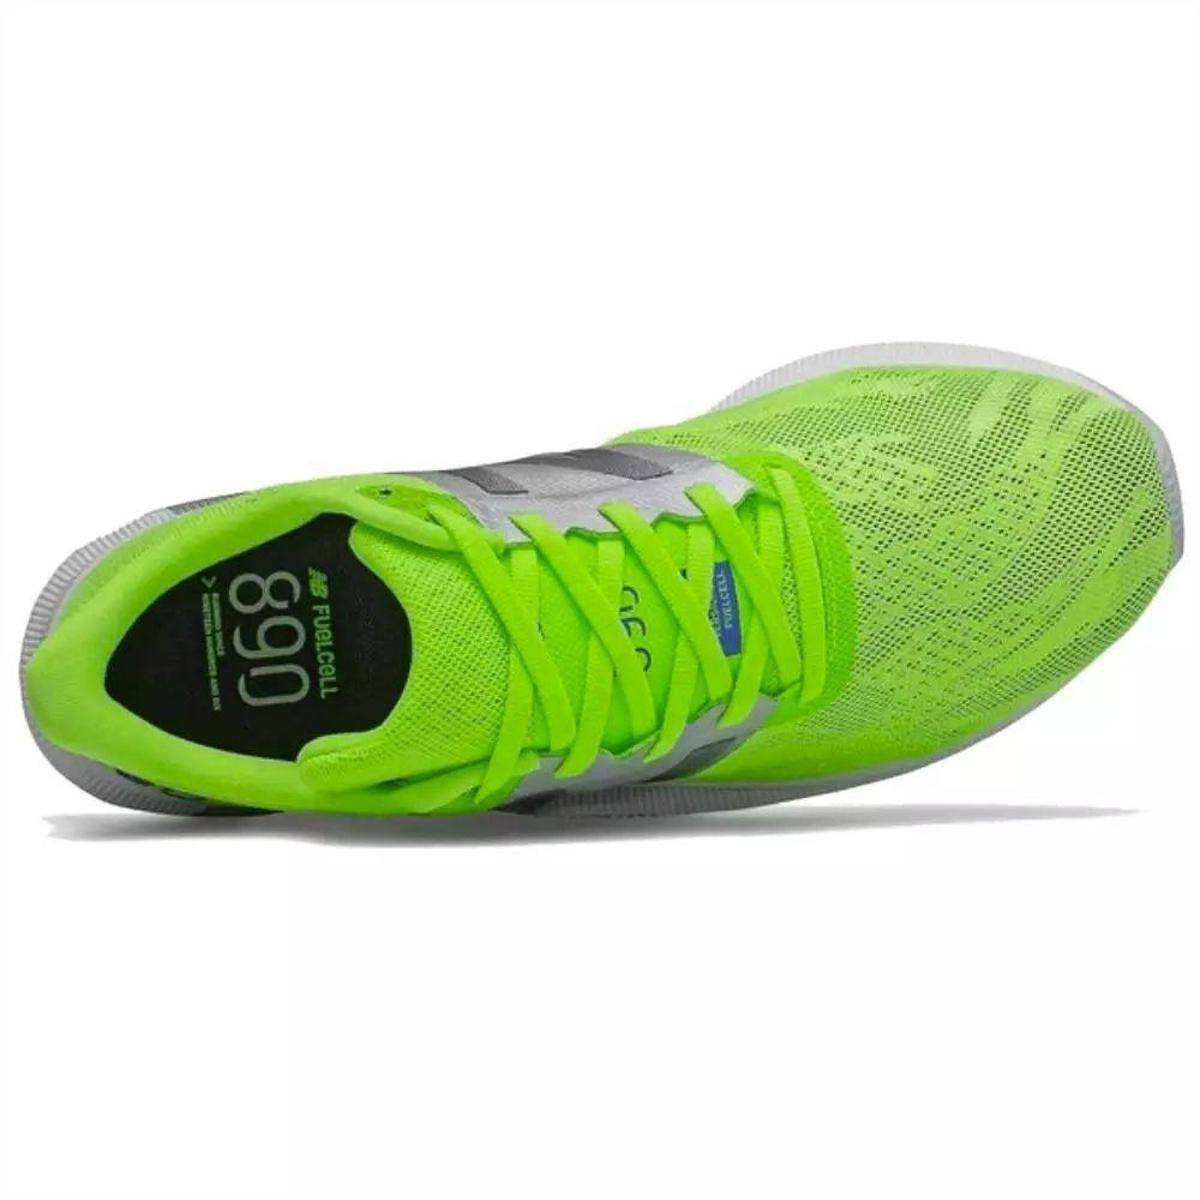 Tenis New Balance 890 V8 Masculino - Verde Limão   Netshoes